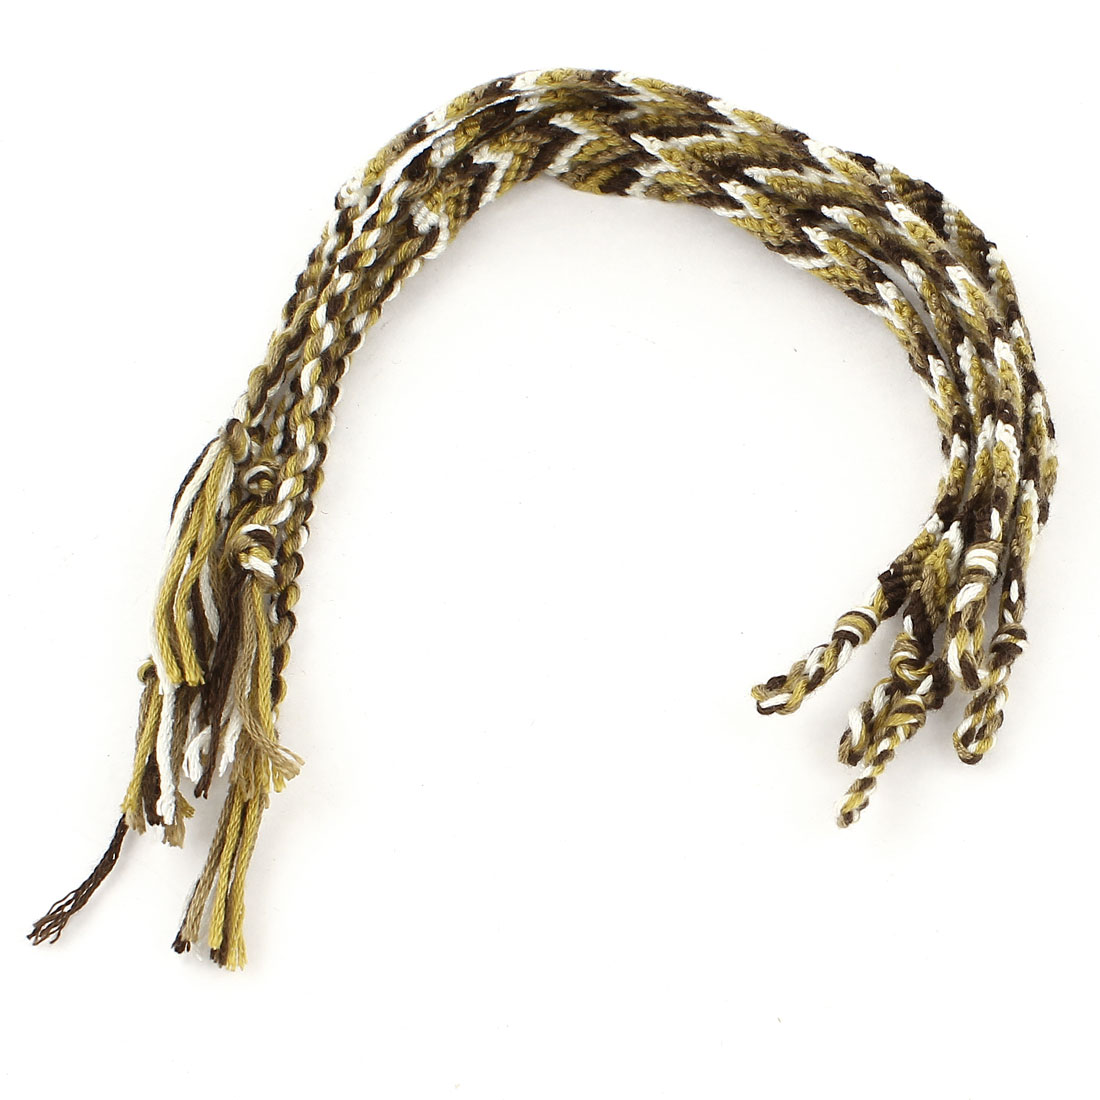 Ladies 4 Colors Acryic Cord Handwork Braided Wrist Accent Bracelet 5 Pcs